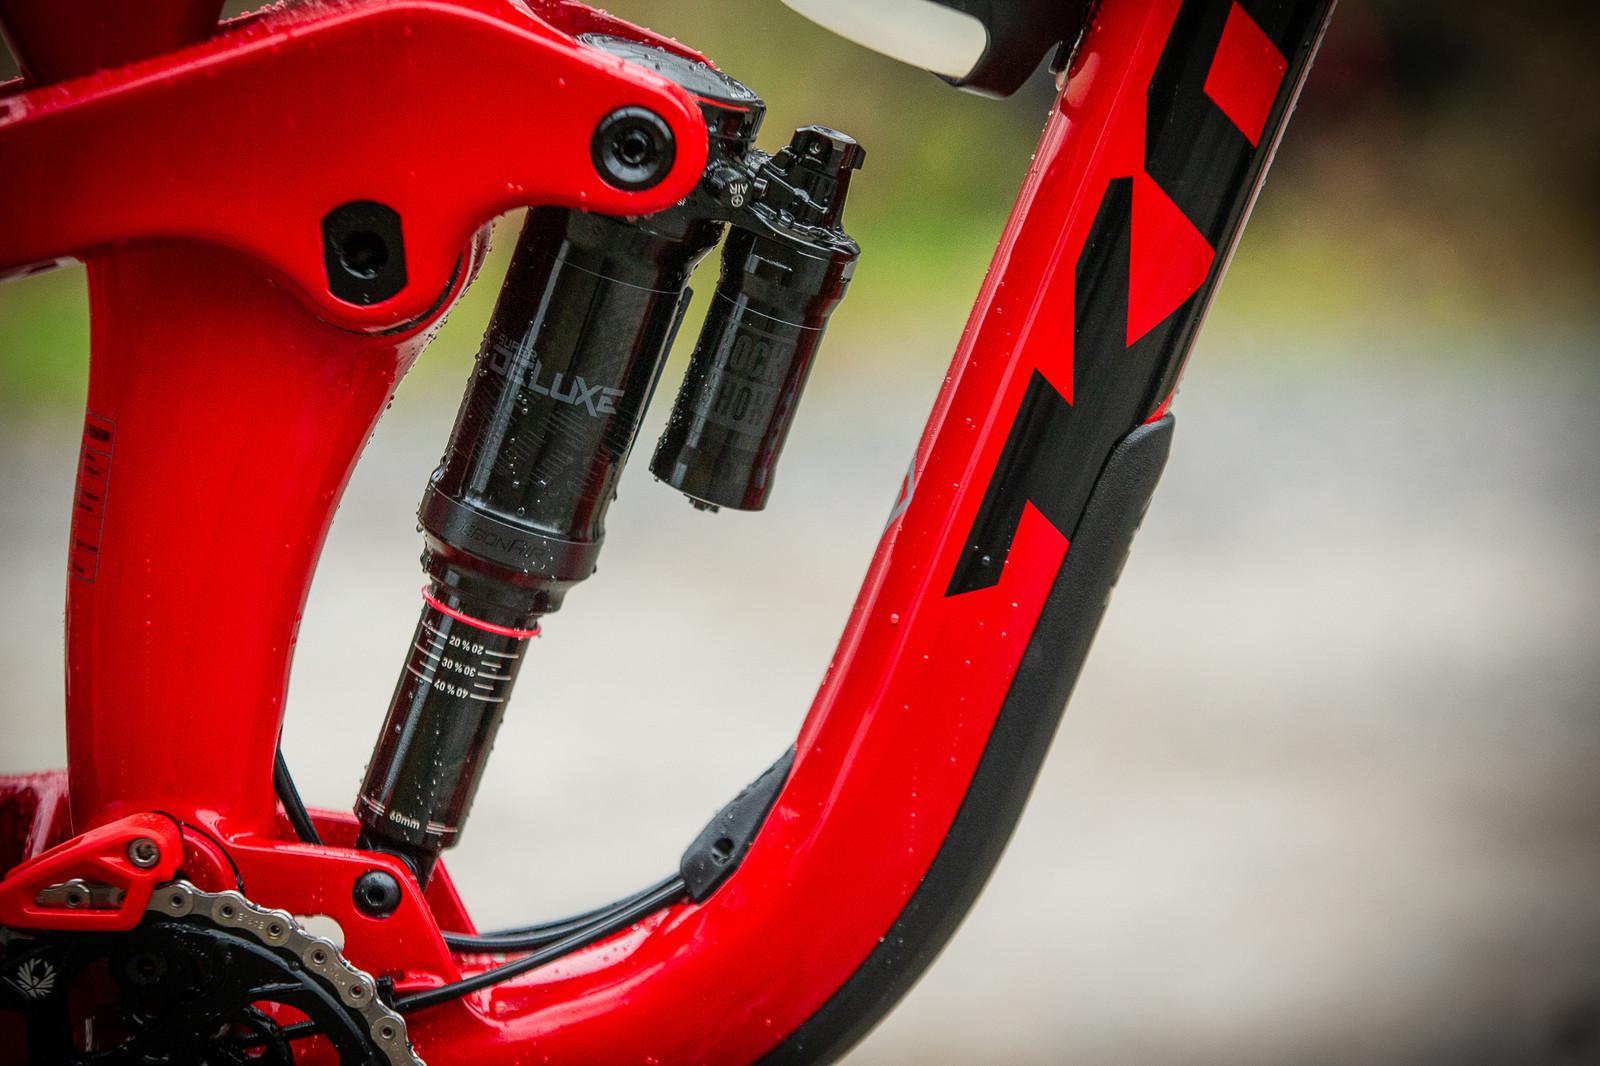 RockShox Lyrik fork and Super Deluxe rear shock handling the suspension duties.